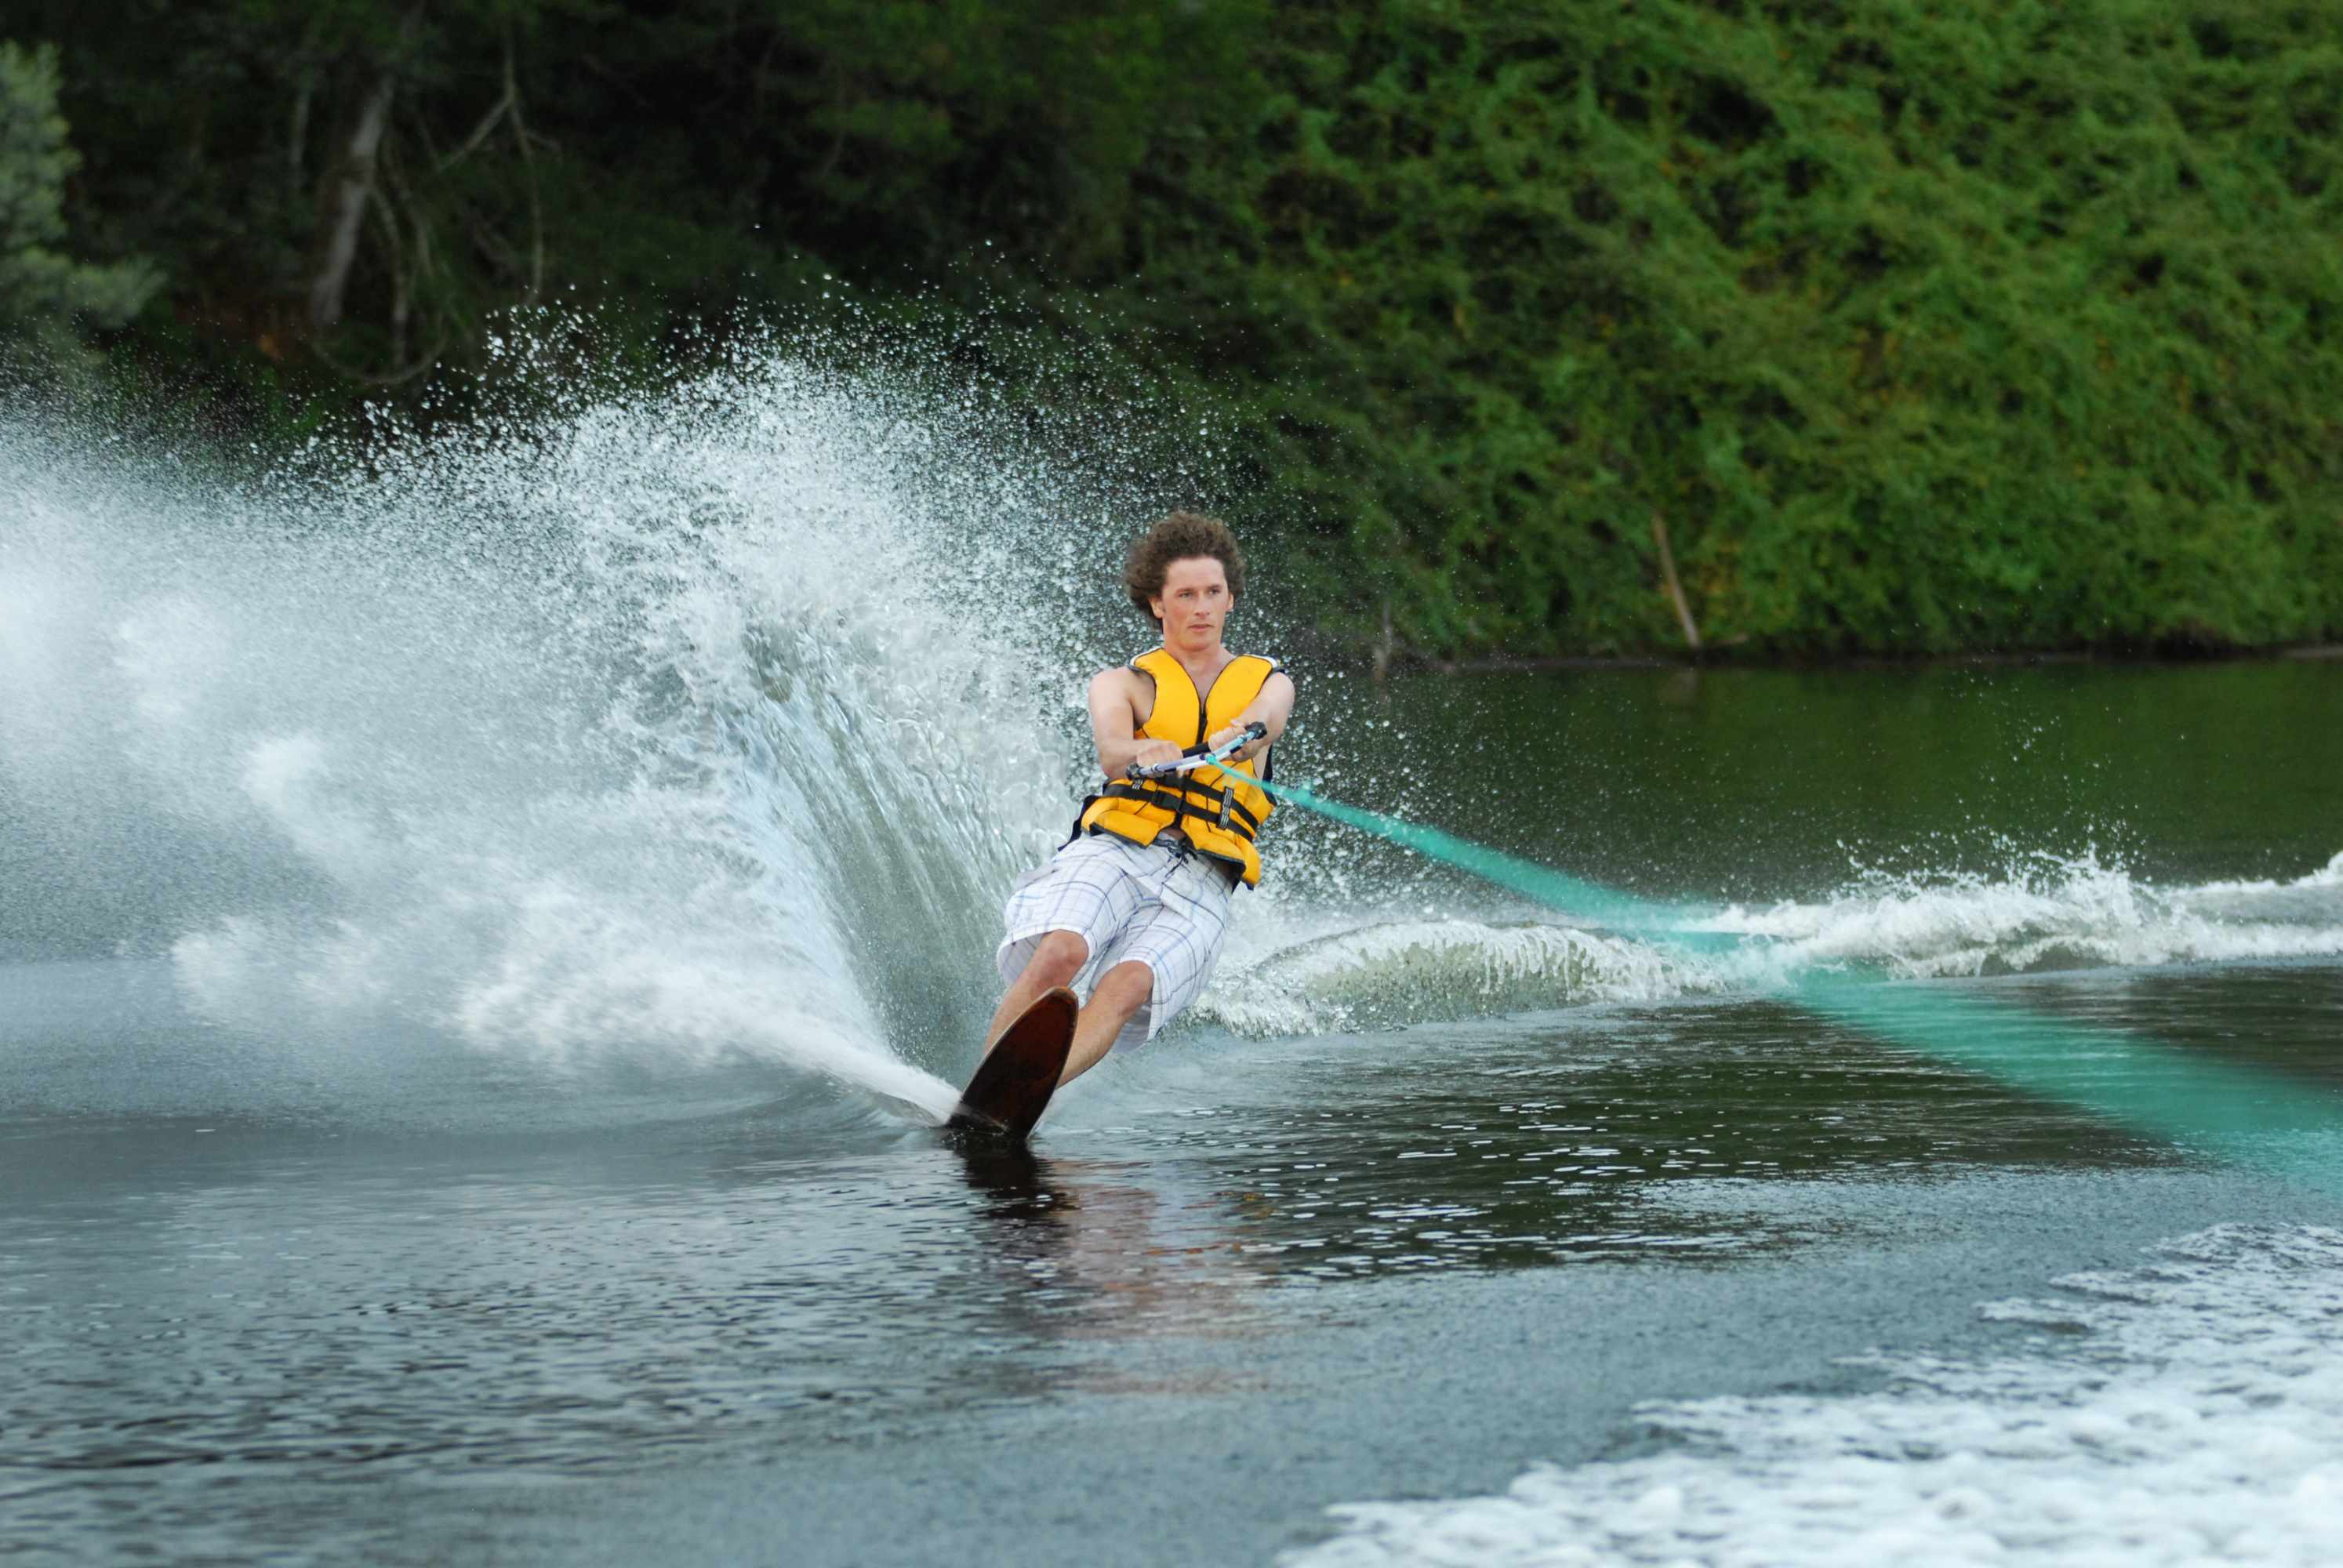 a boy teenager water skiing wearing a life jacket